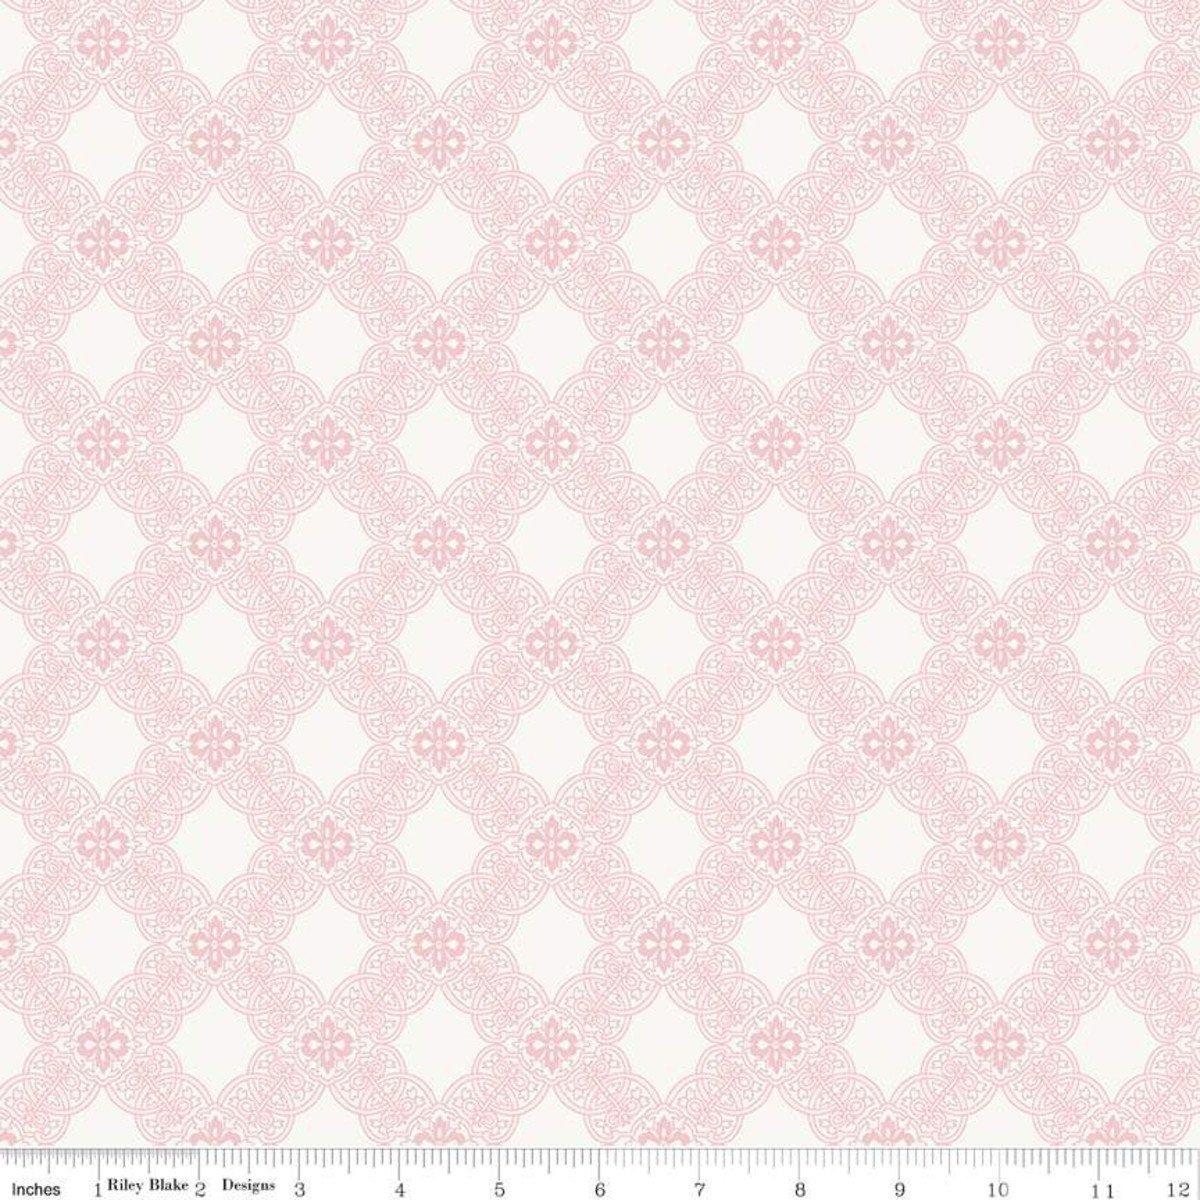 C7682-PINK_Tile Rose Garden